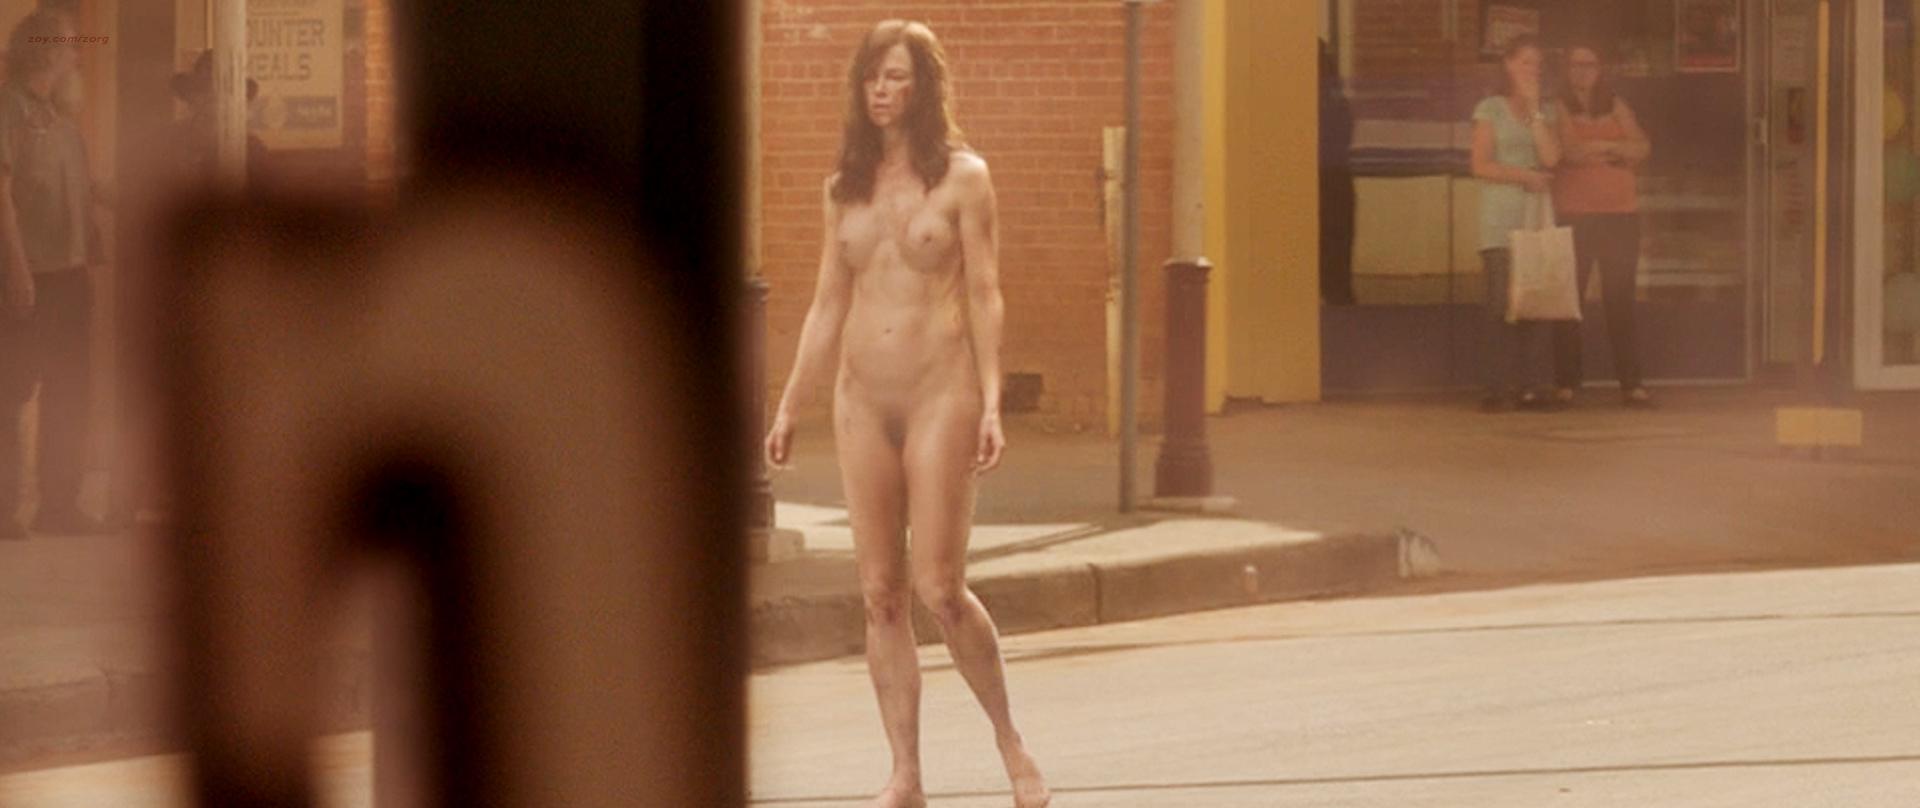 Nicole Kidman nude full frontal or bd and Madisson Brown hot - Strangerland (2015) hd1080p BluRay (16)